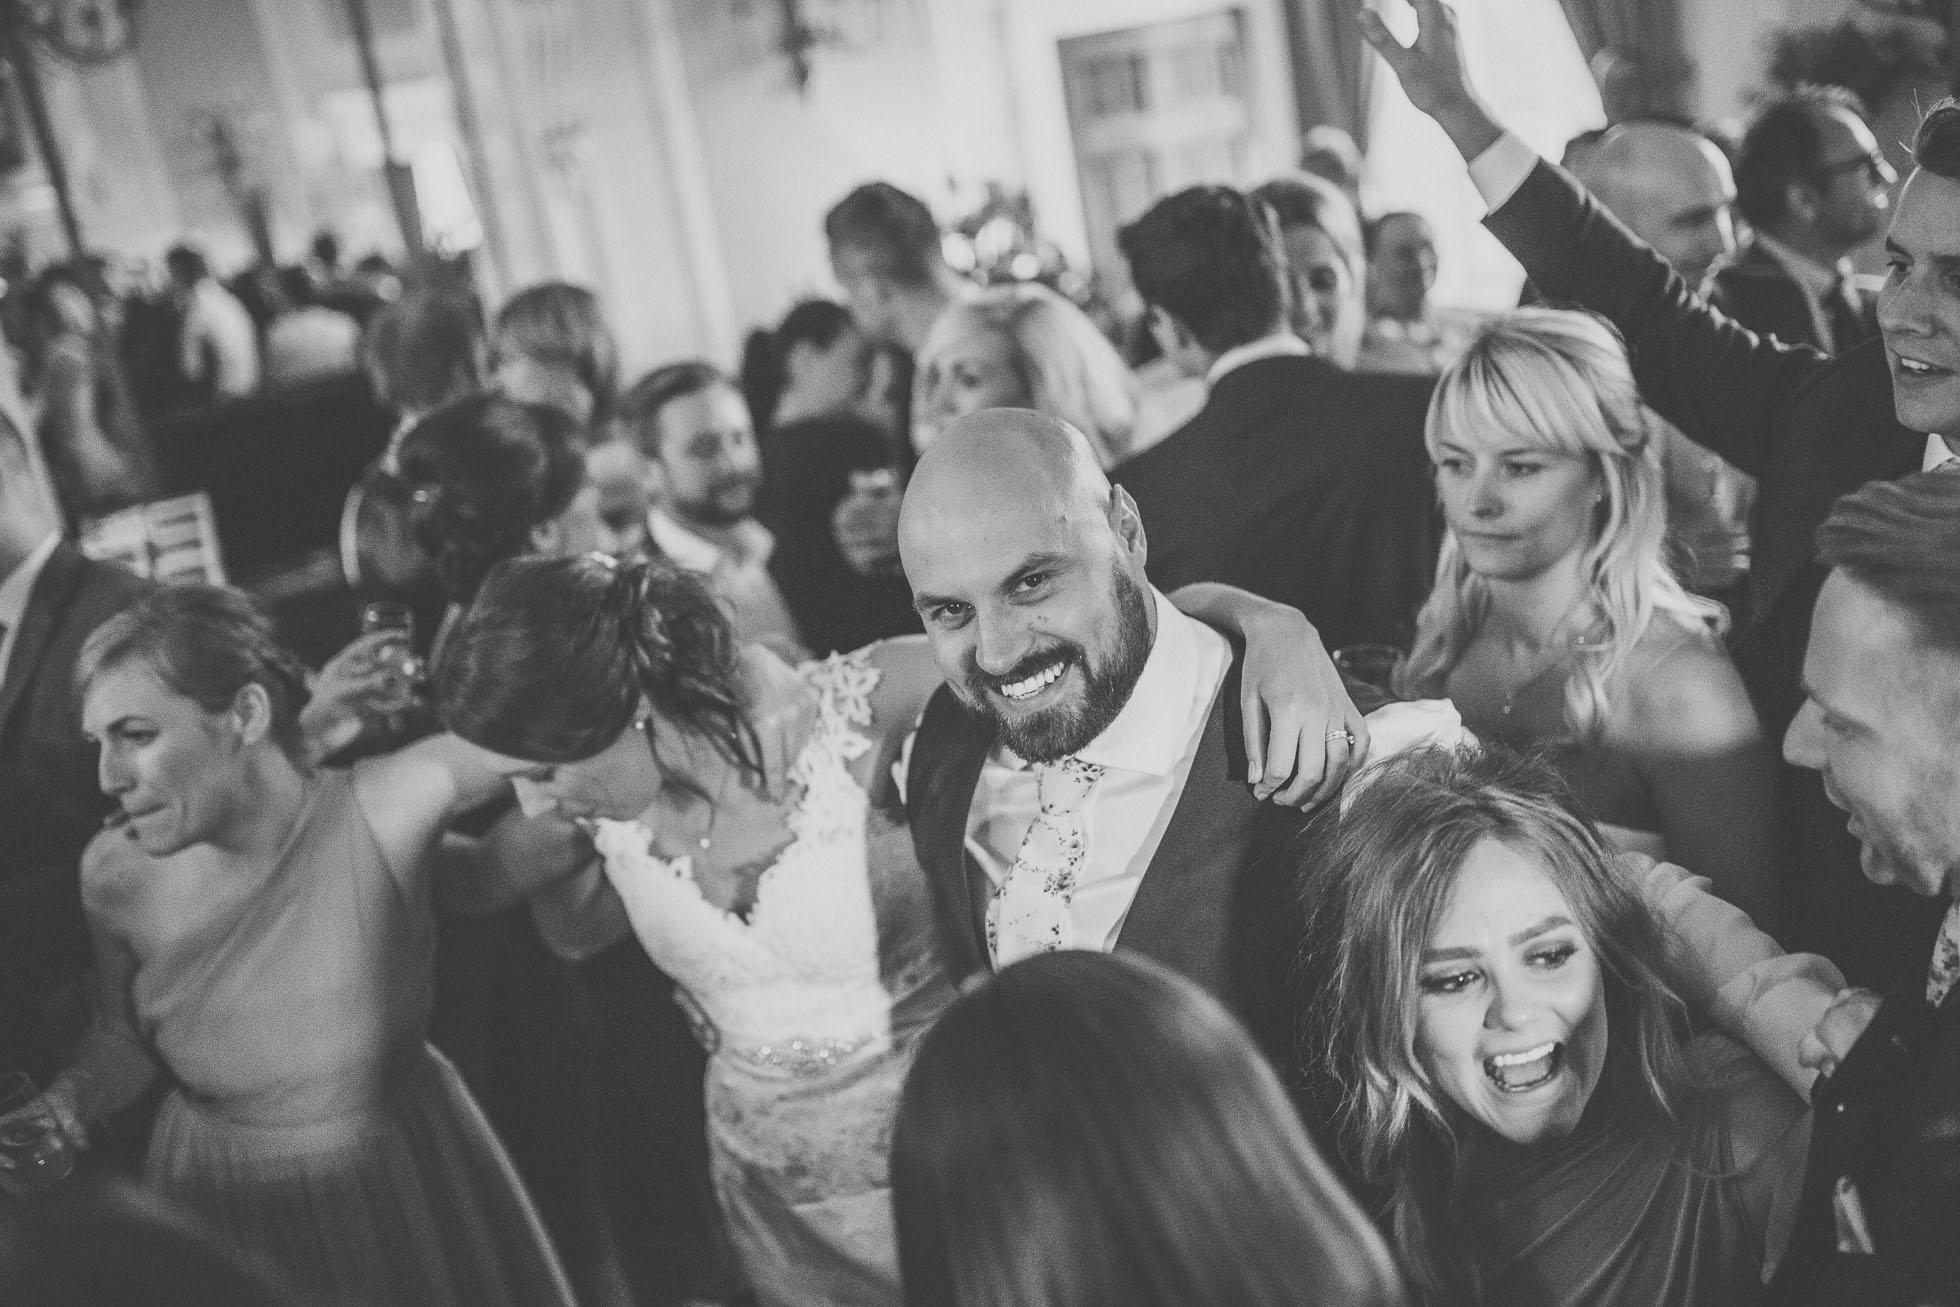 denton-hall-wedding-photographer-66.jpg